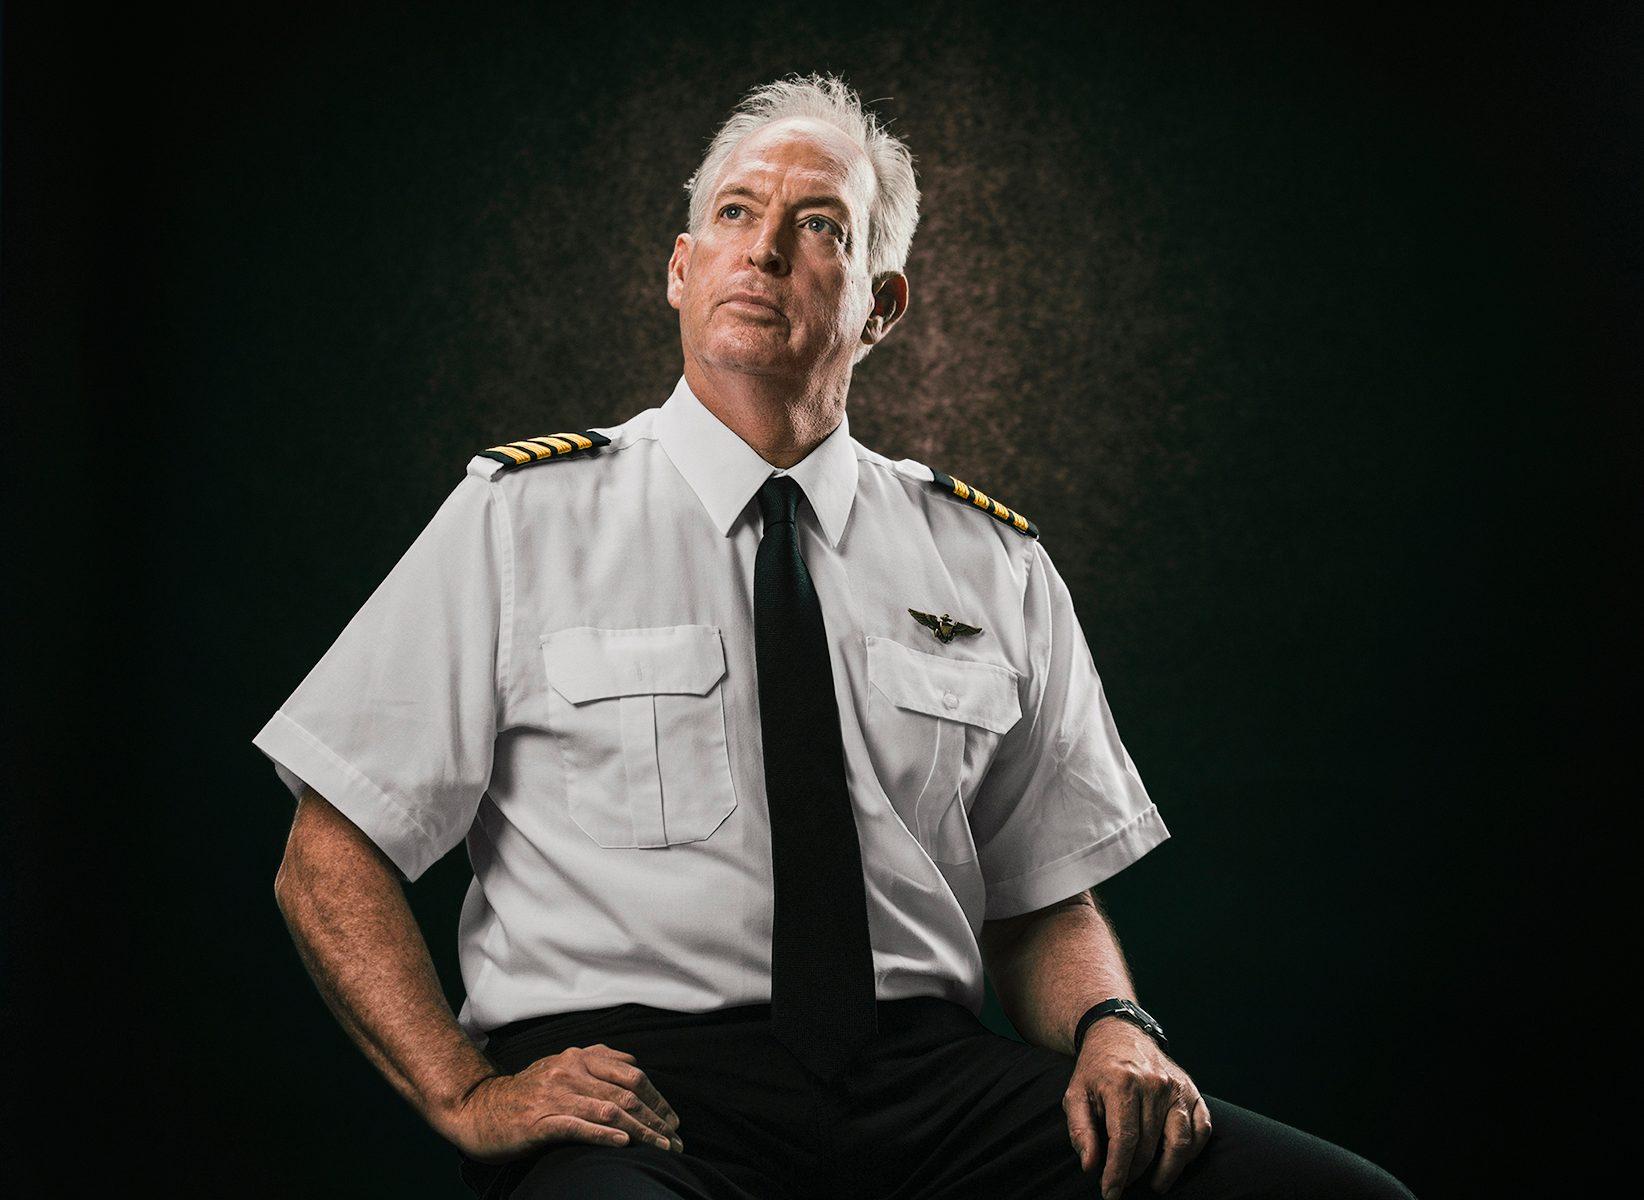 Captain Kevin Sullivan